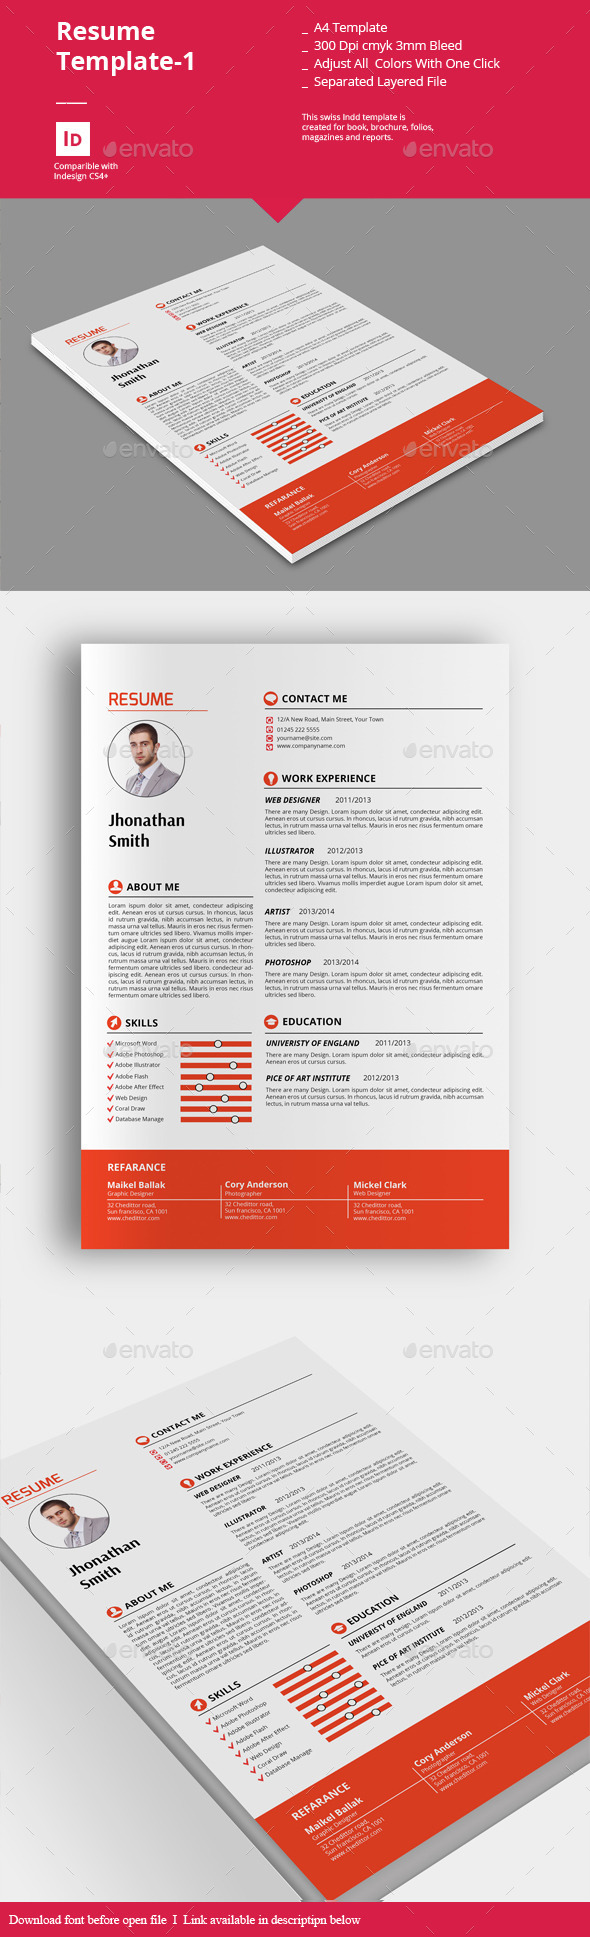 Resume Templates-1 - Resumes Stationery